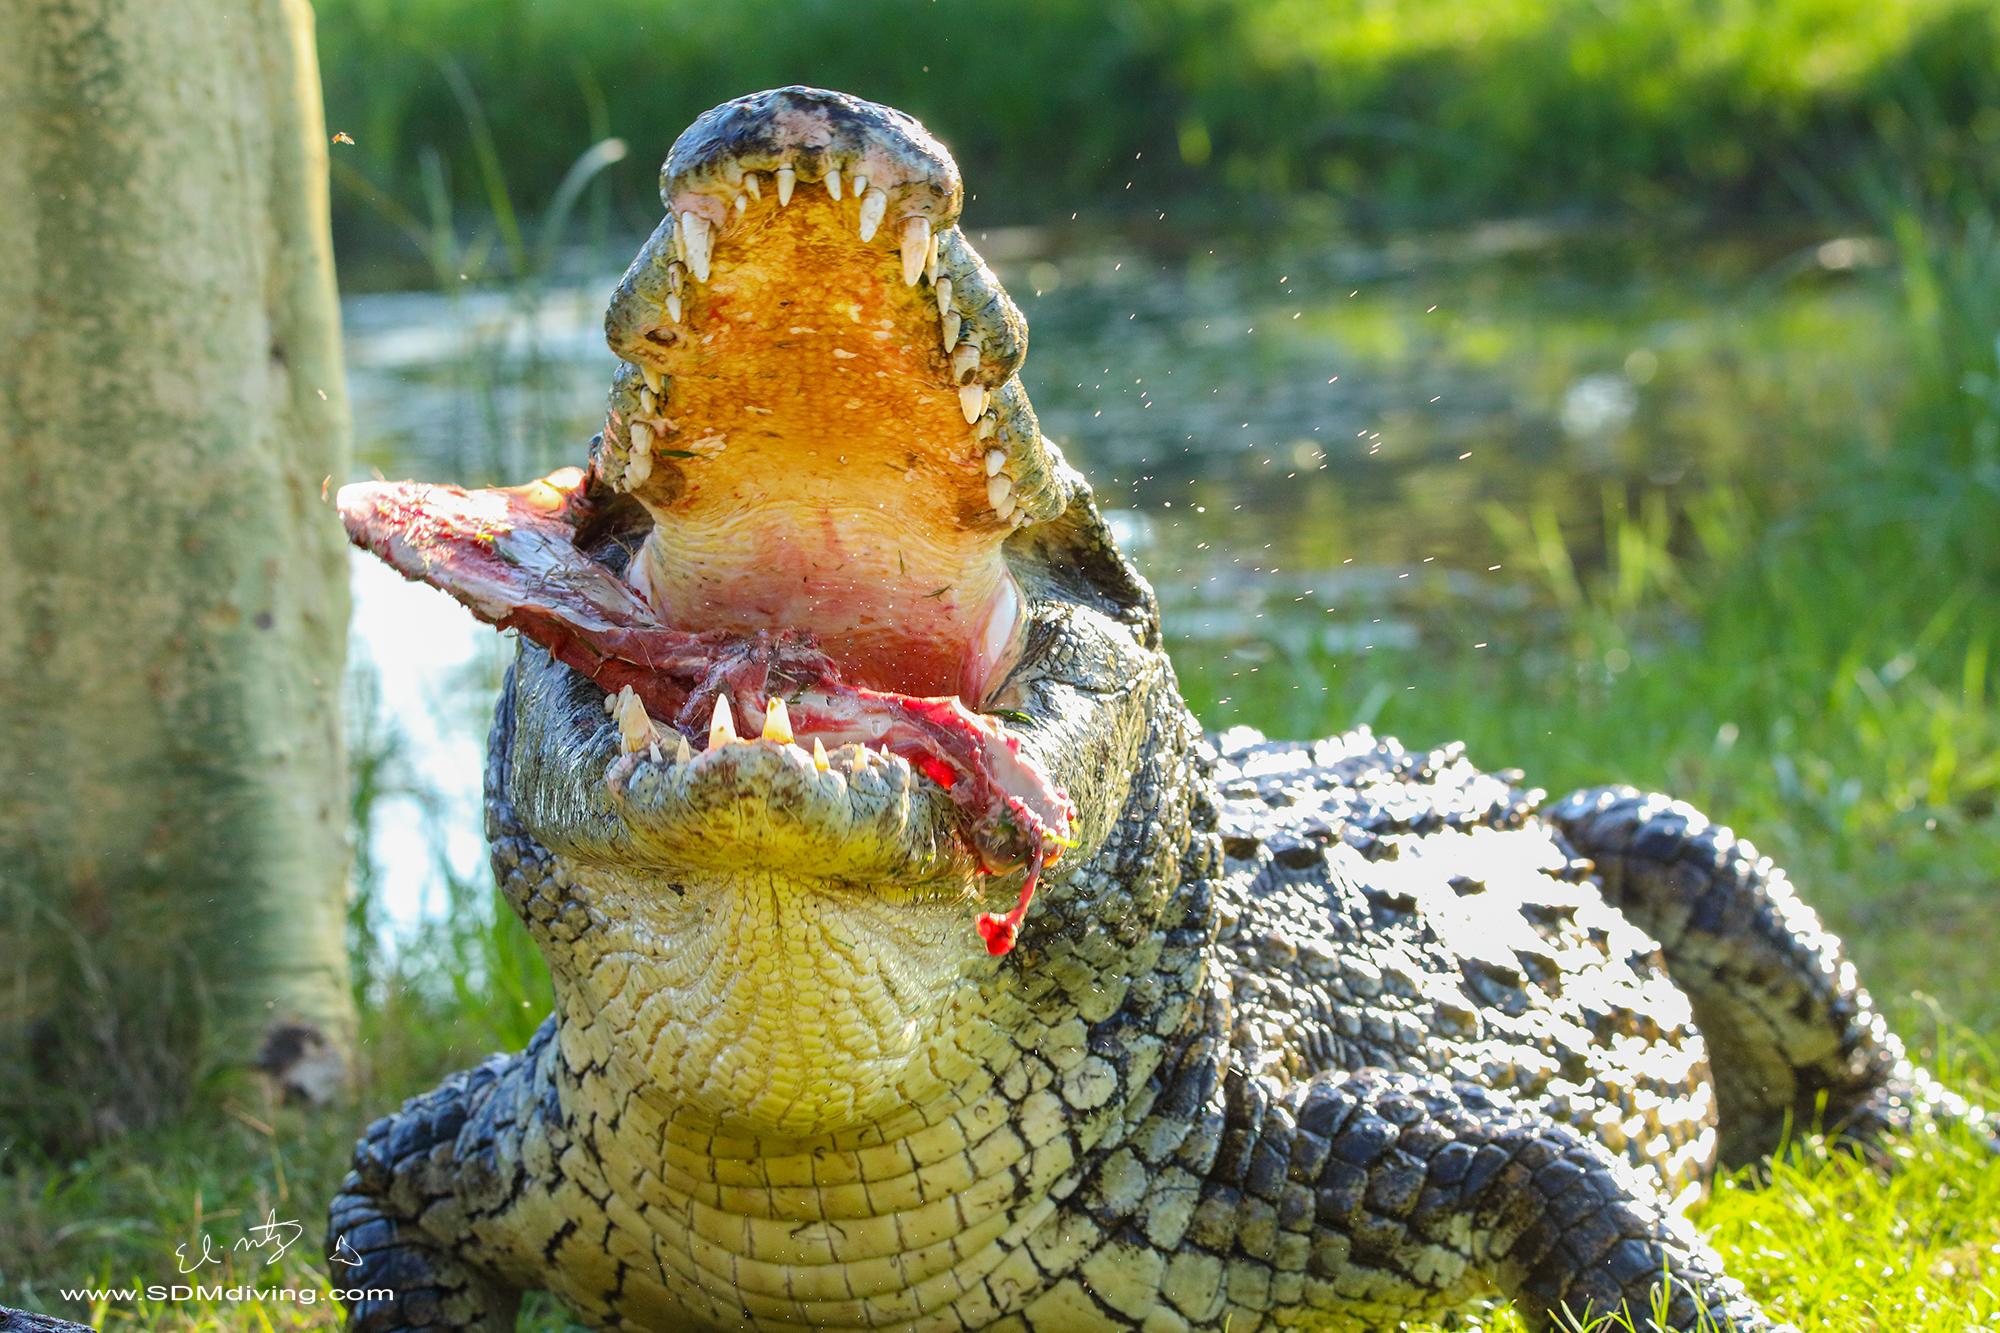 nile croc 3.jpg